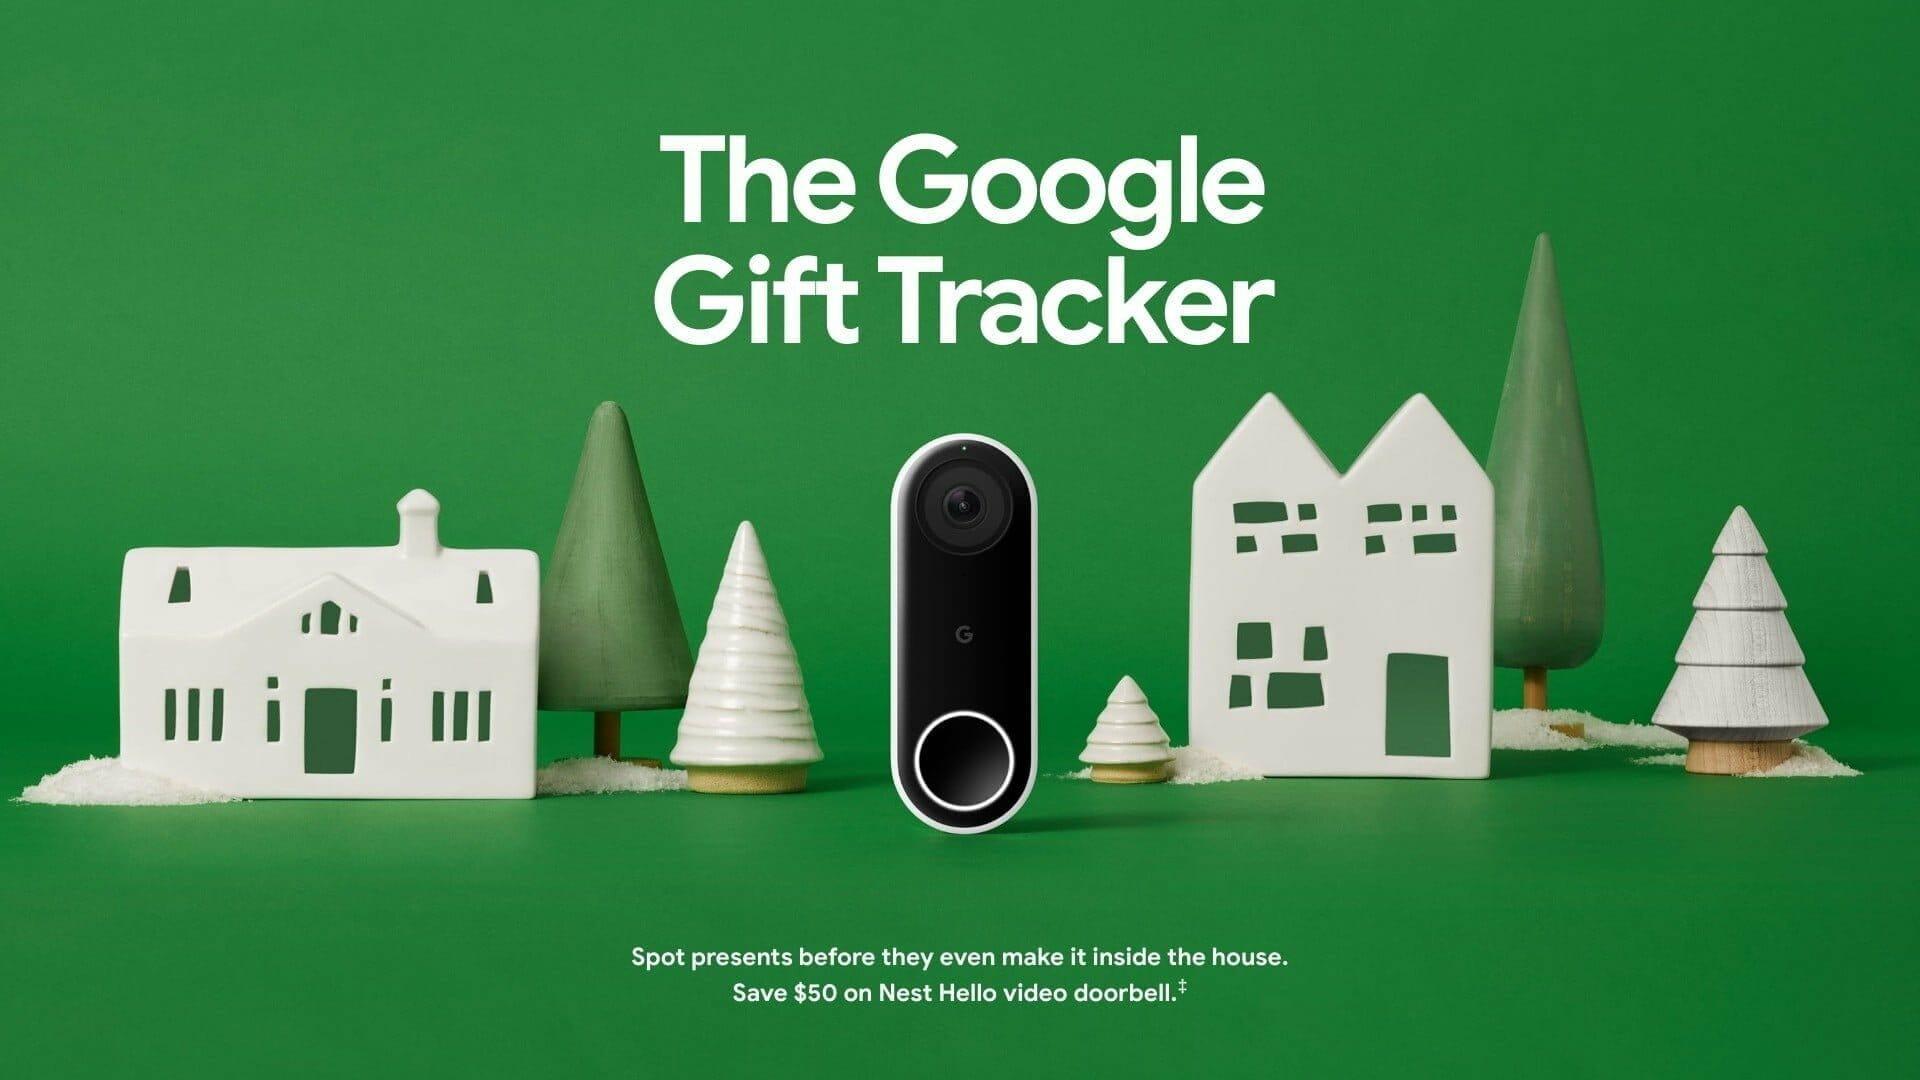 Google ホリデー デザイン:スマート ドアベル「Google Nest Hello」